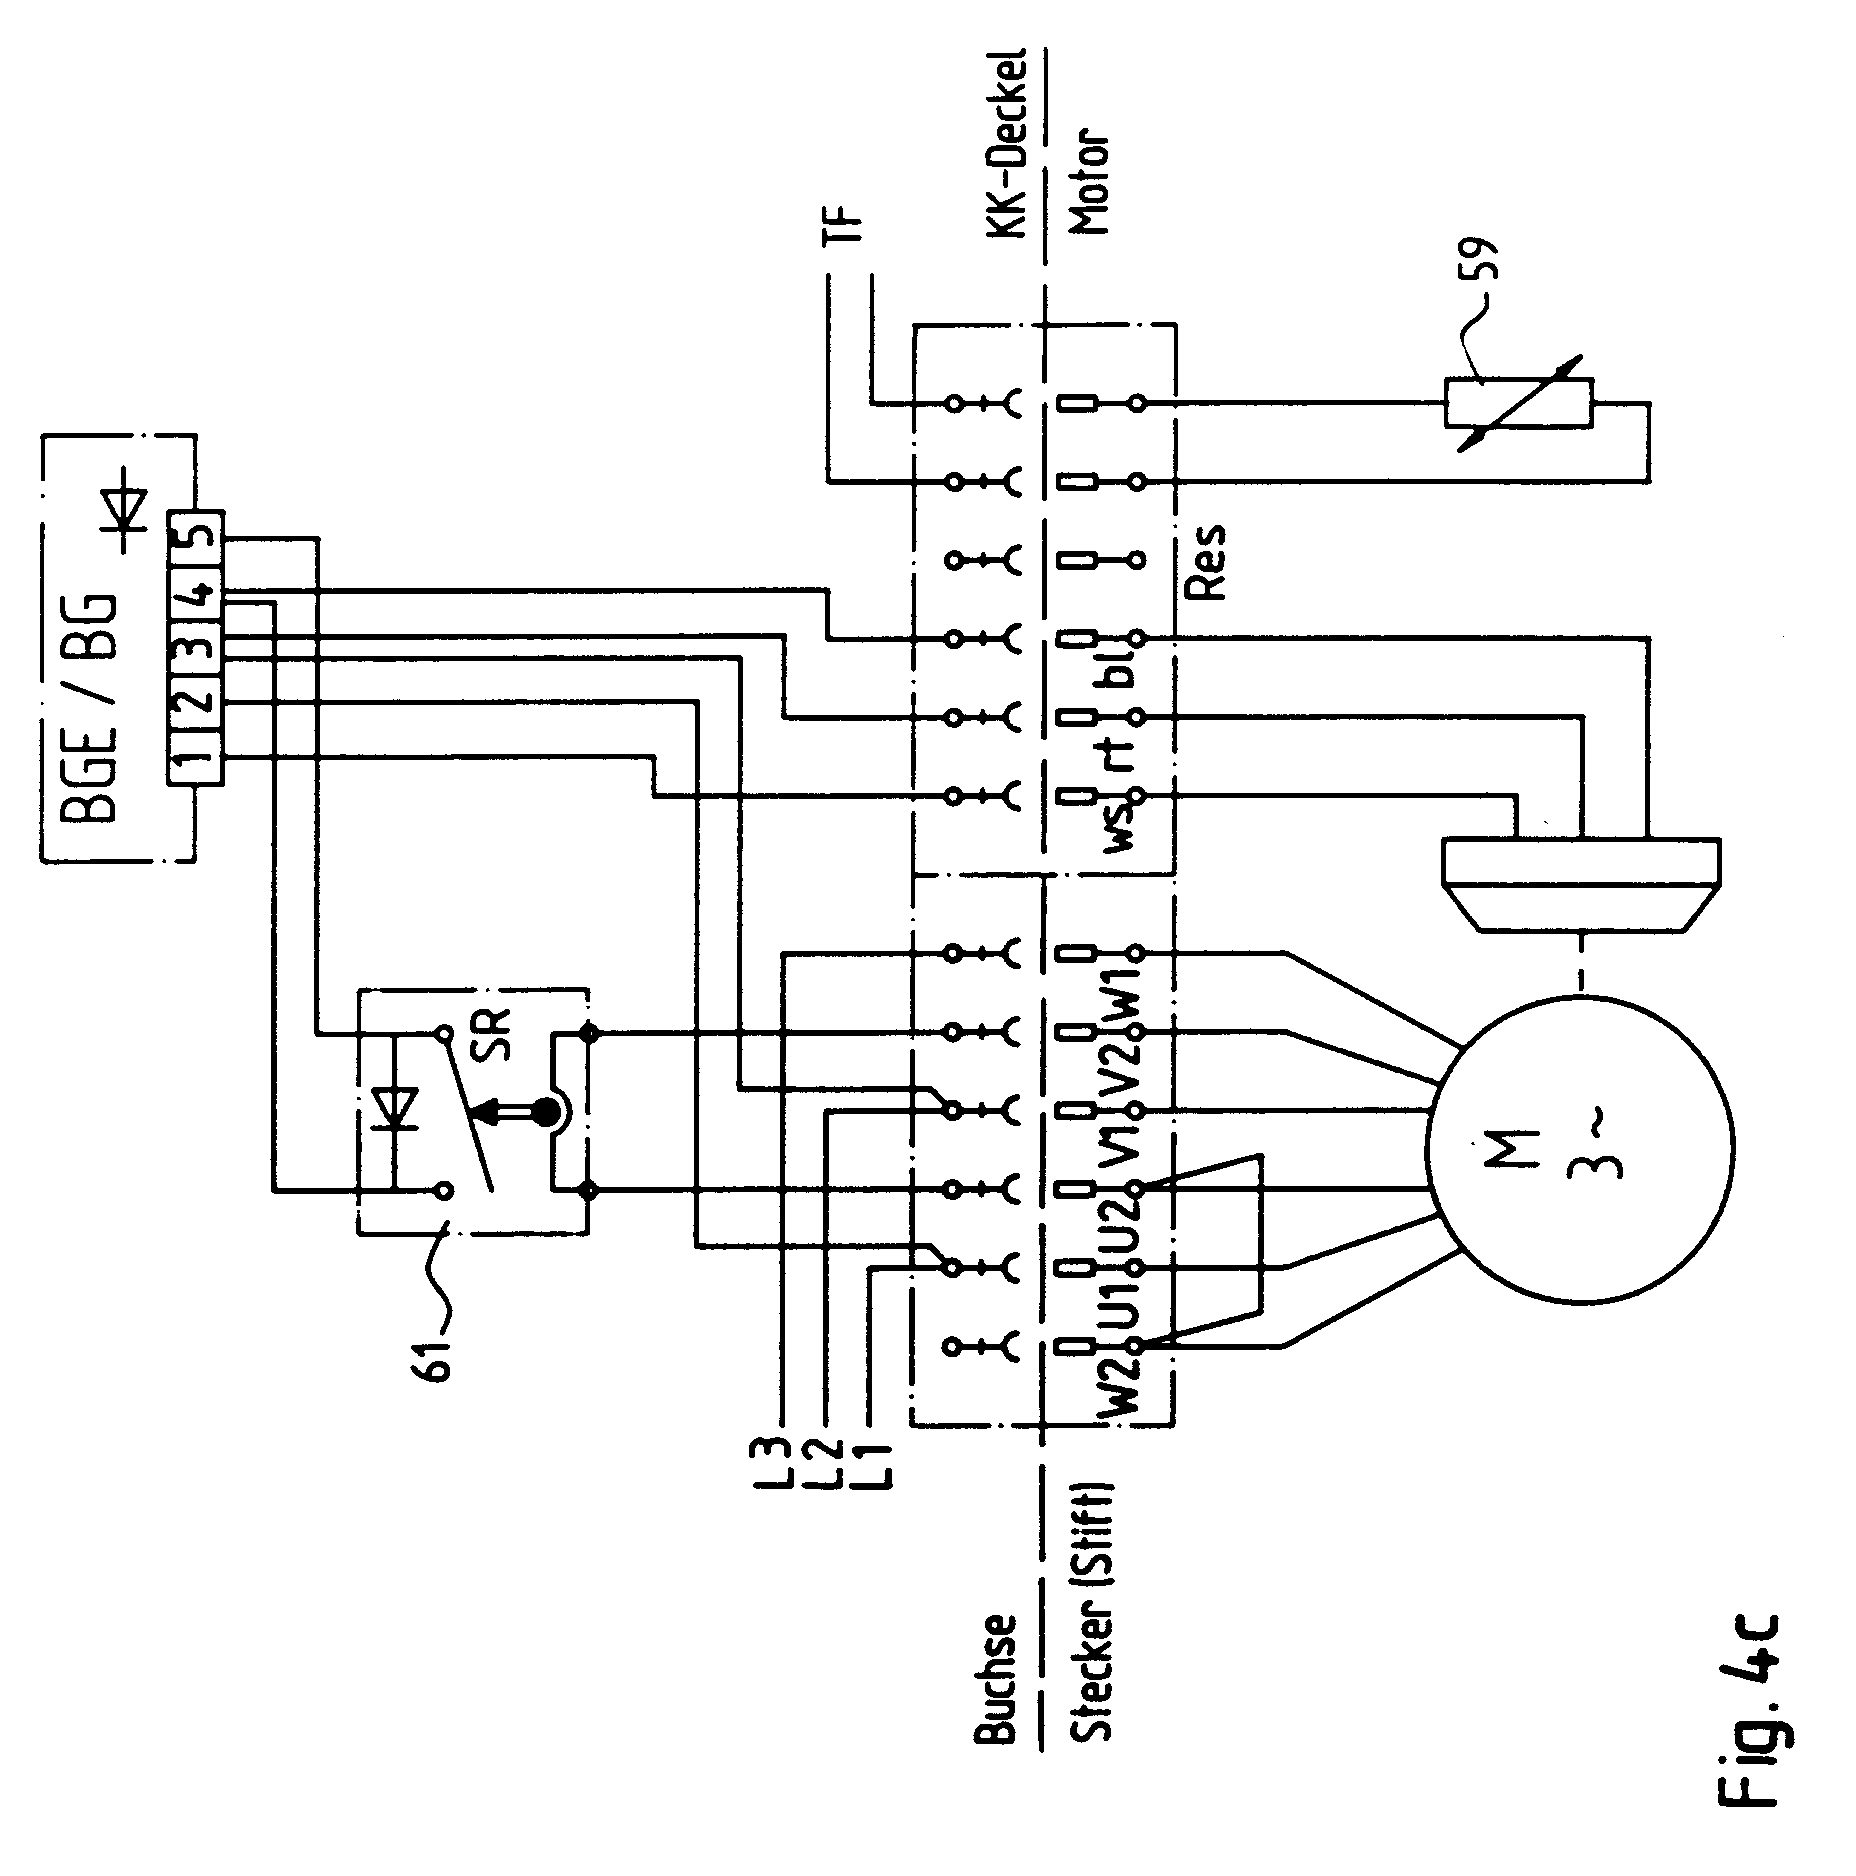 Eurodrive Wiring Diagrams   Fiat Punto Heater Wiring Diagram ...